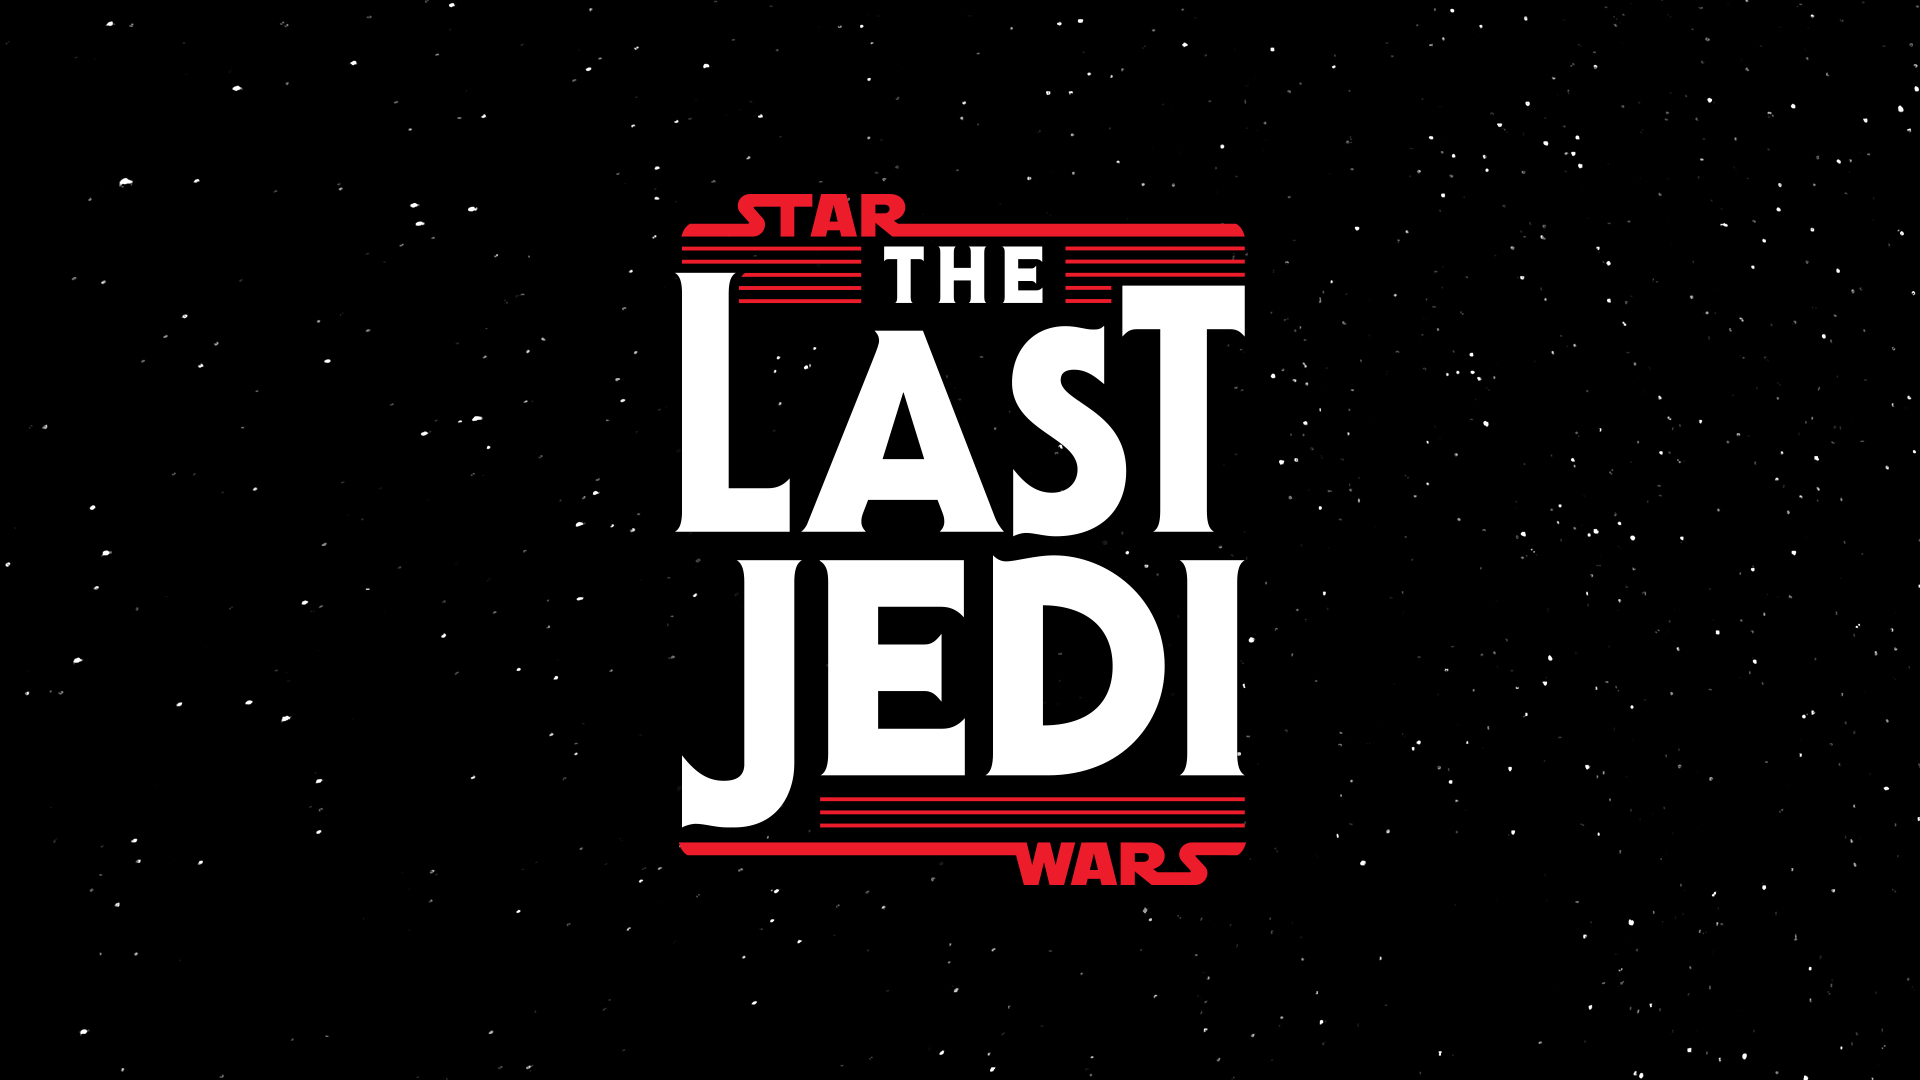 Star Wars: The Last Jedi  Logo Designs on Behance.